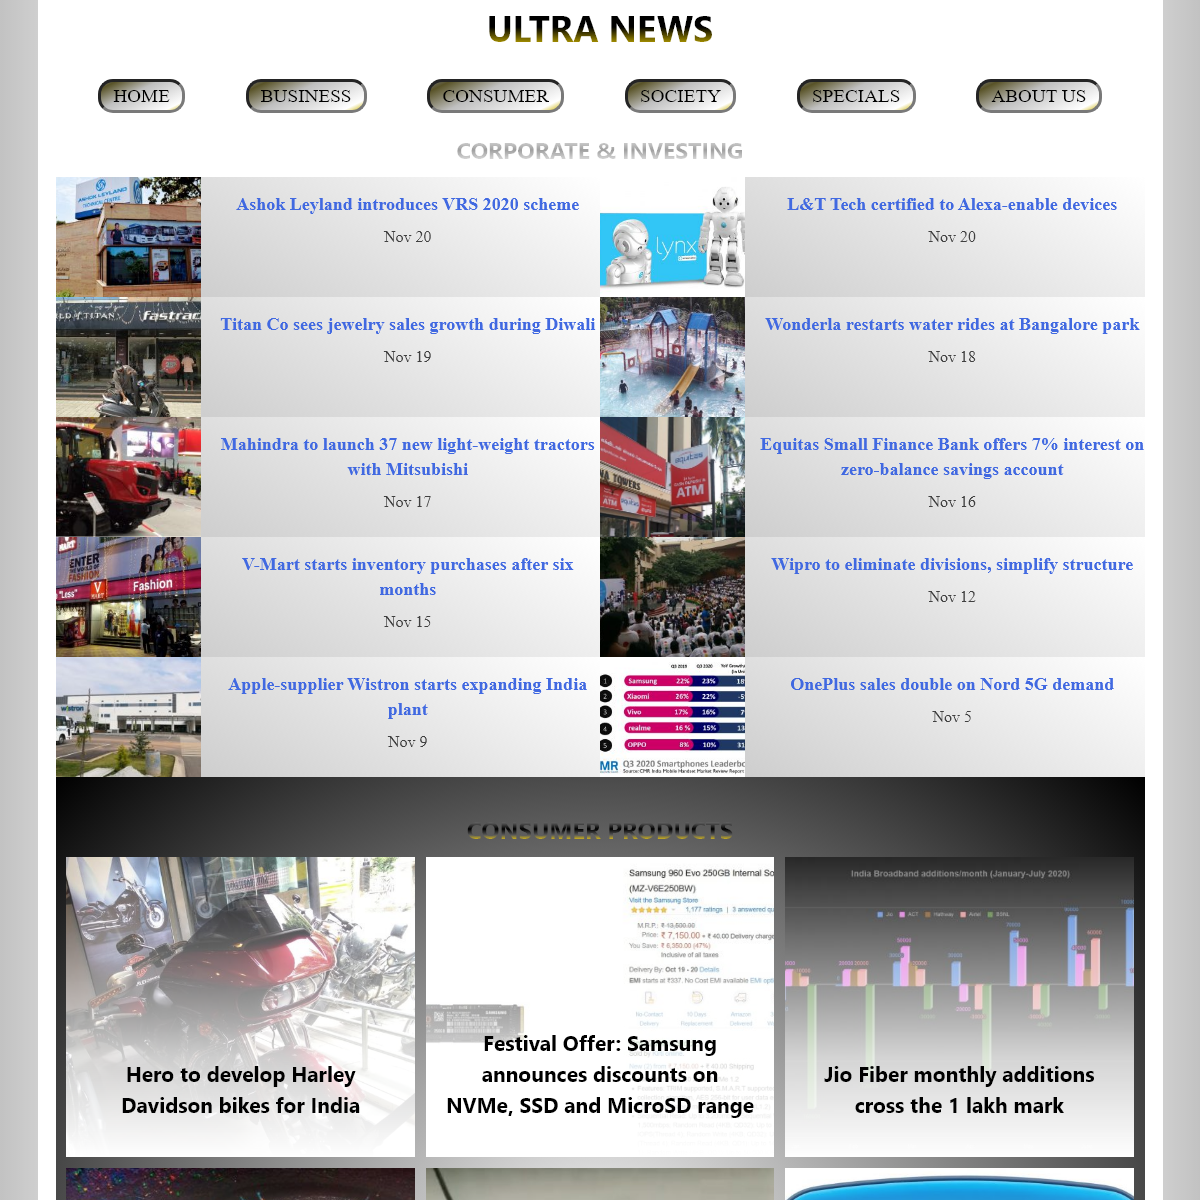 HOME - Ultra News